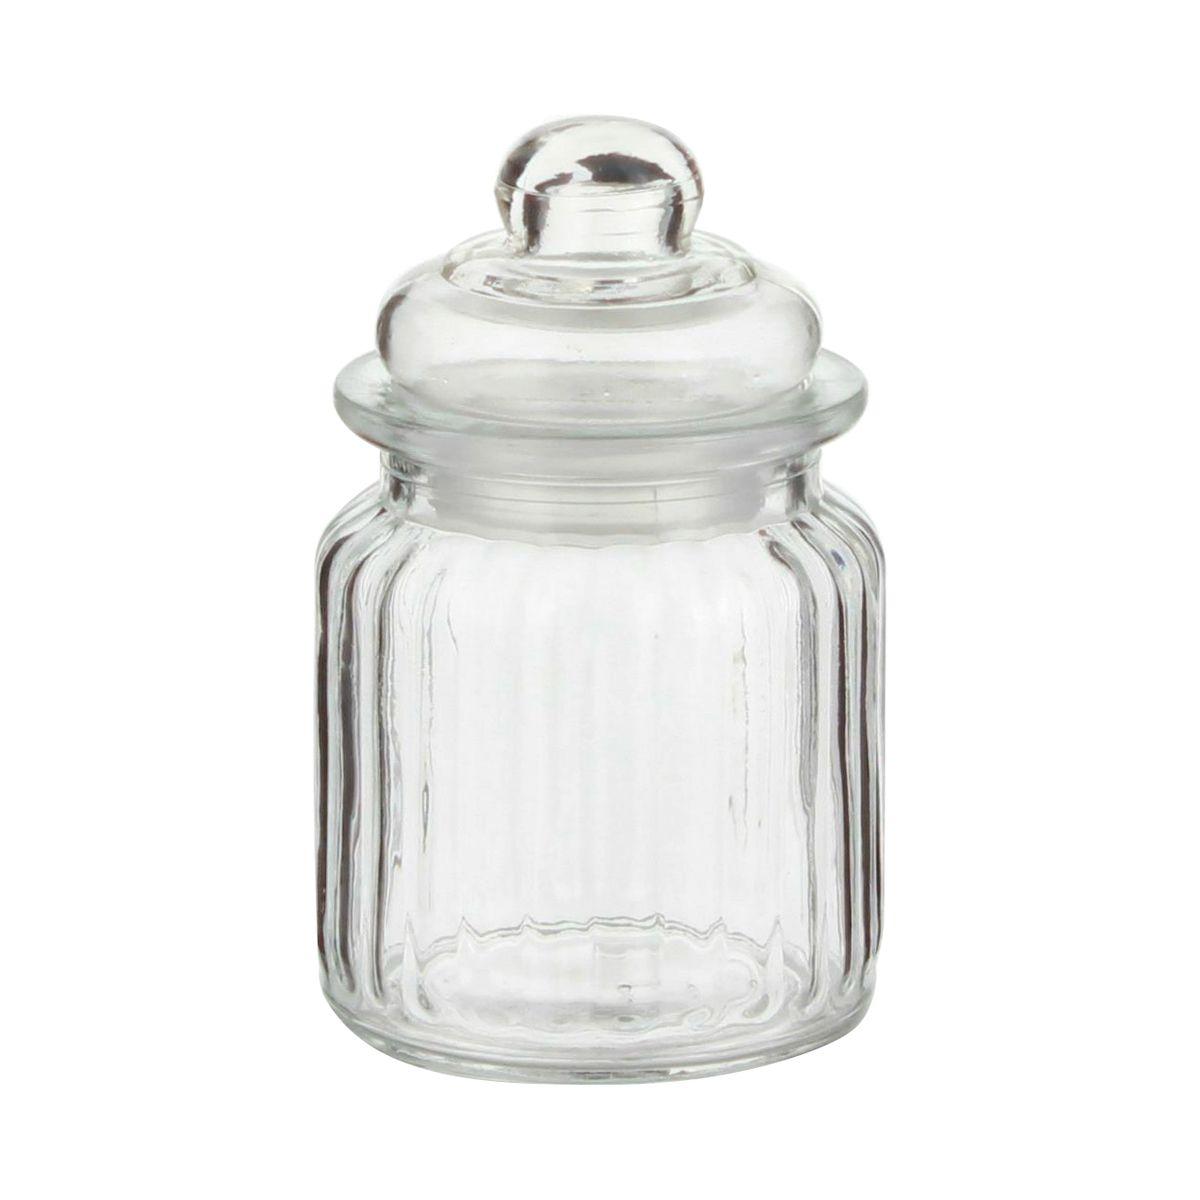 Bonbonnière en verre Nostalgie 250ml - Zeller